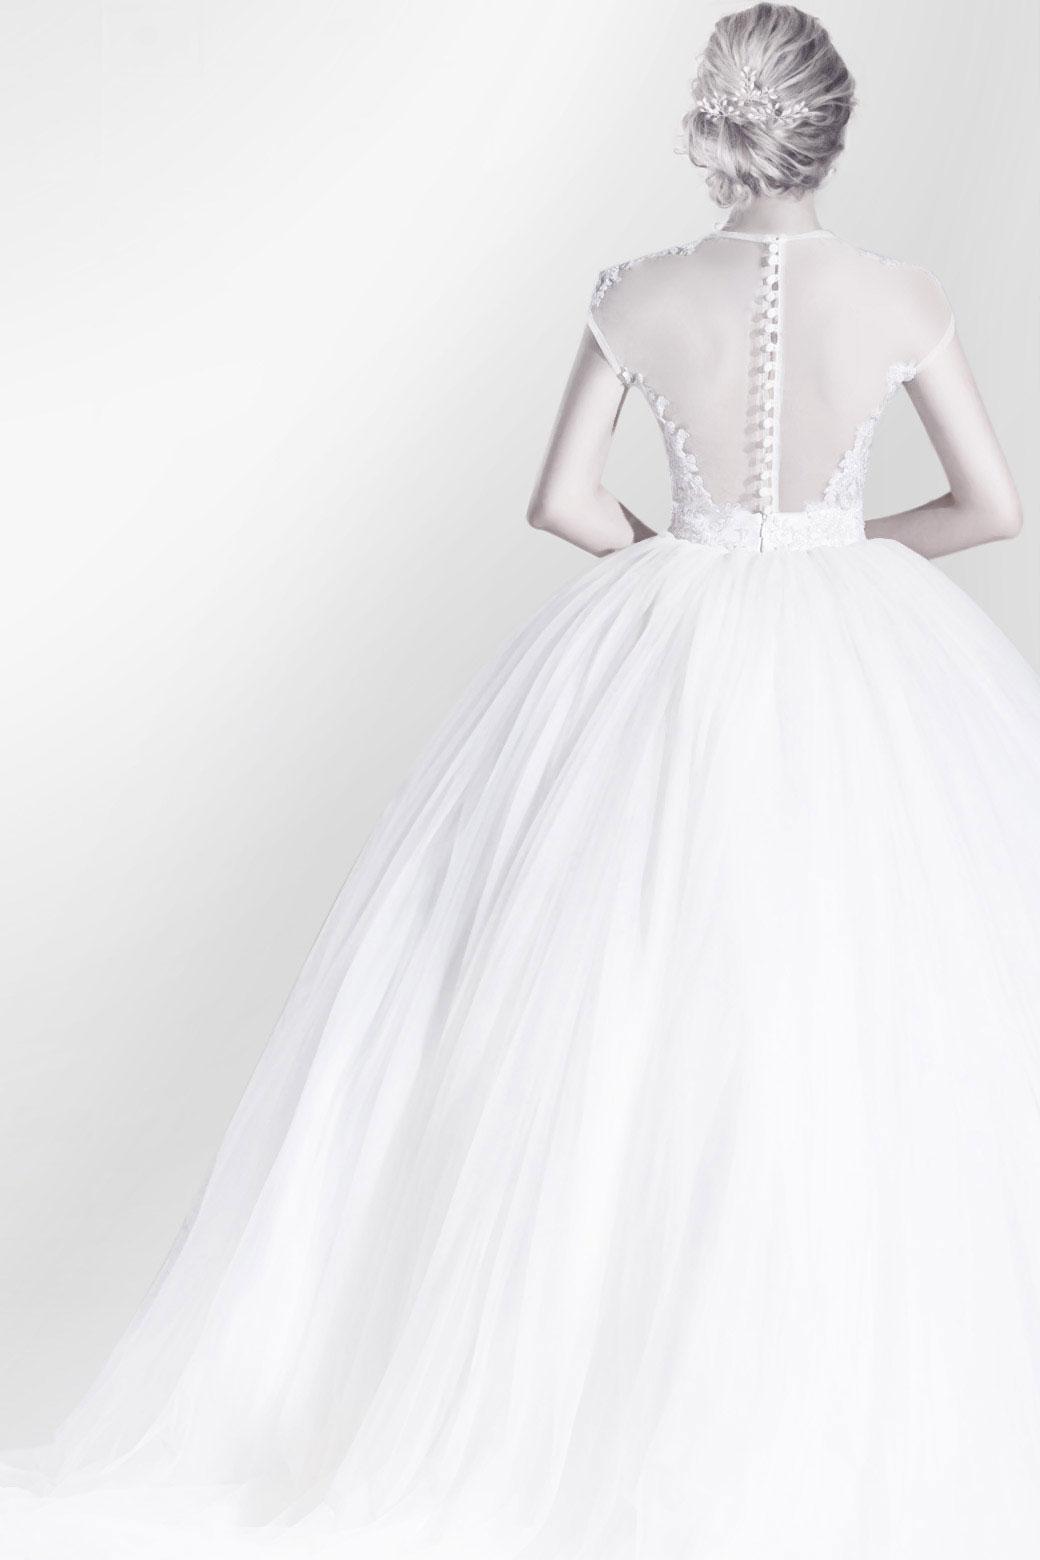 about - bride